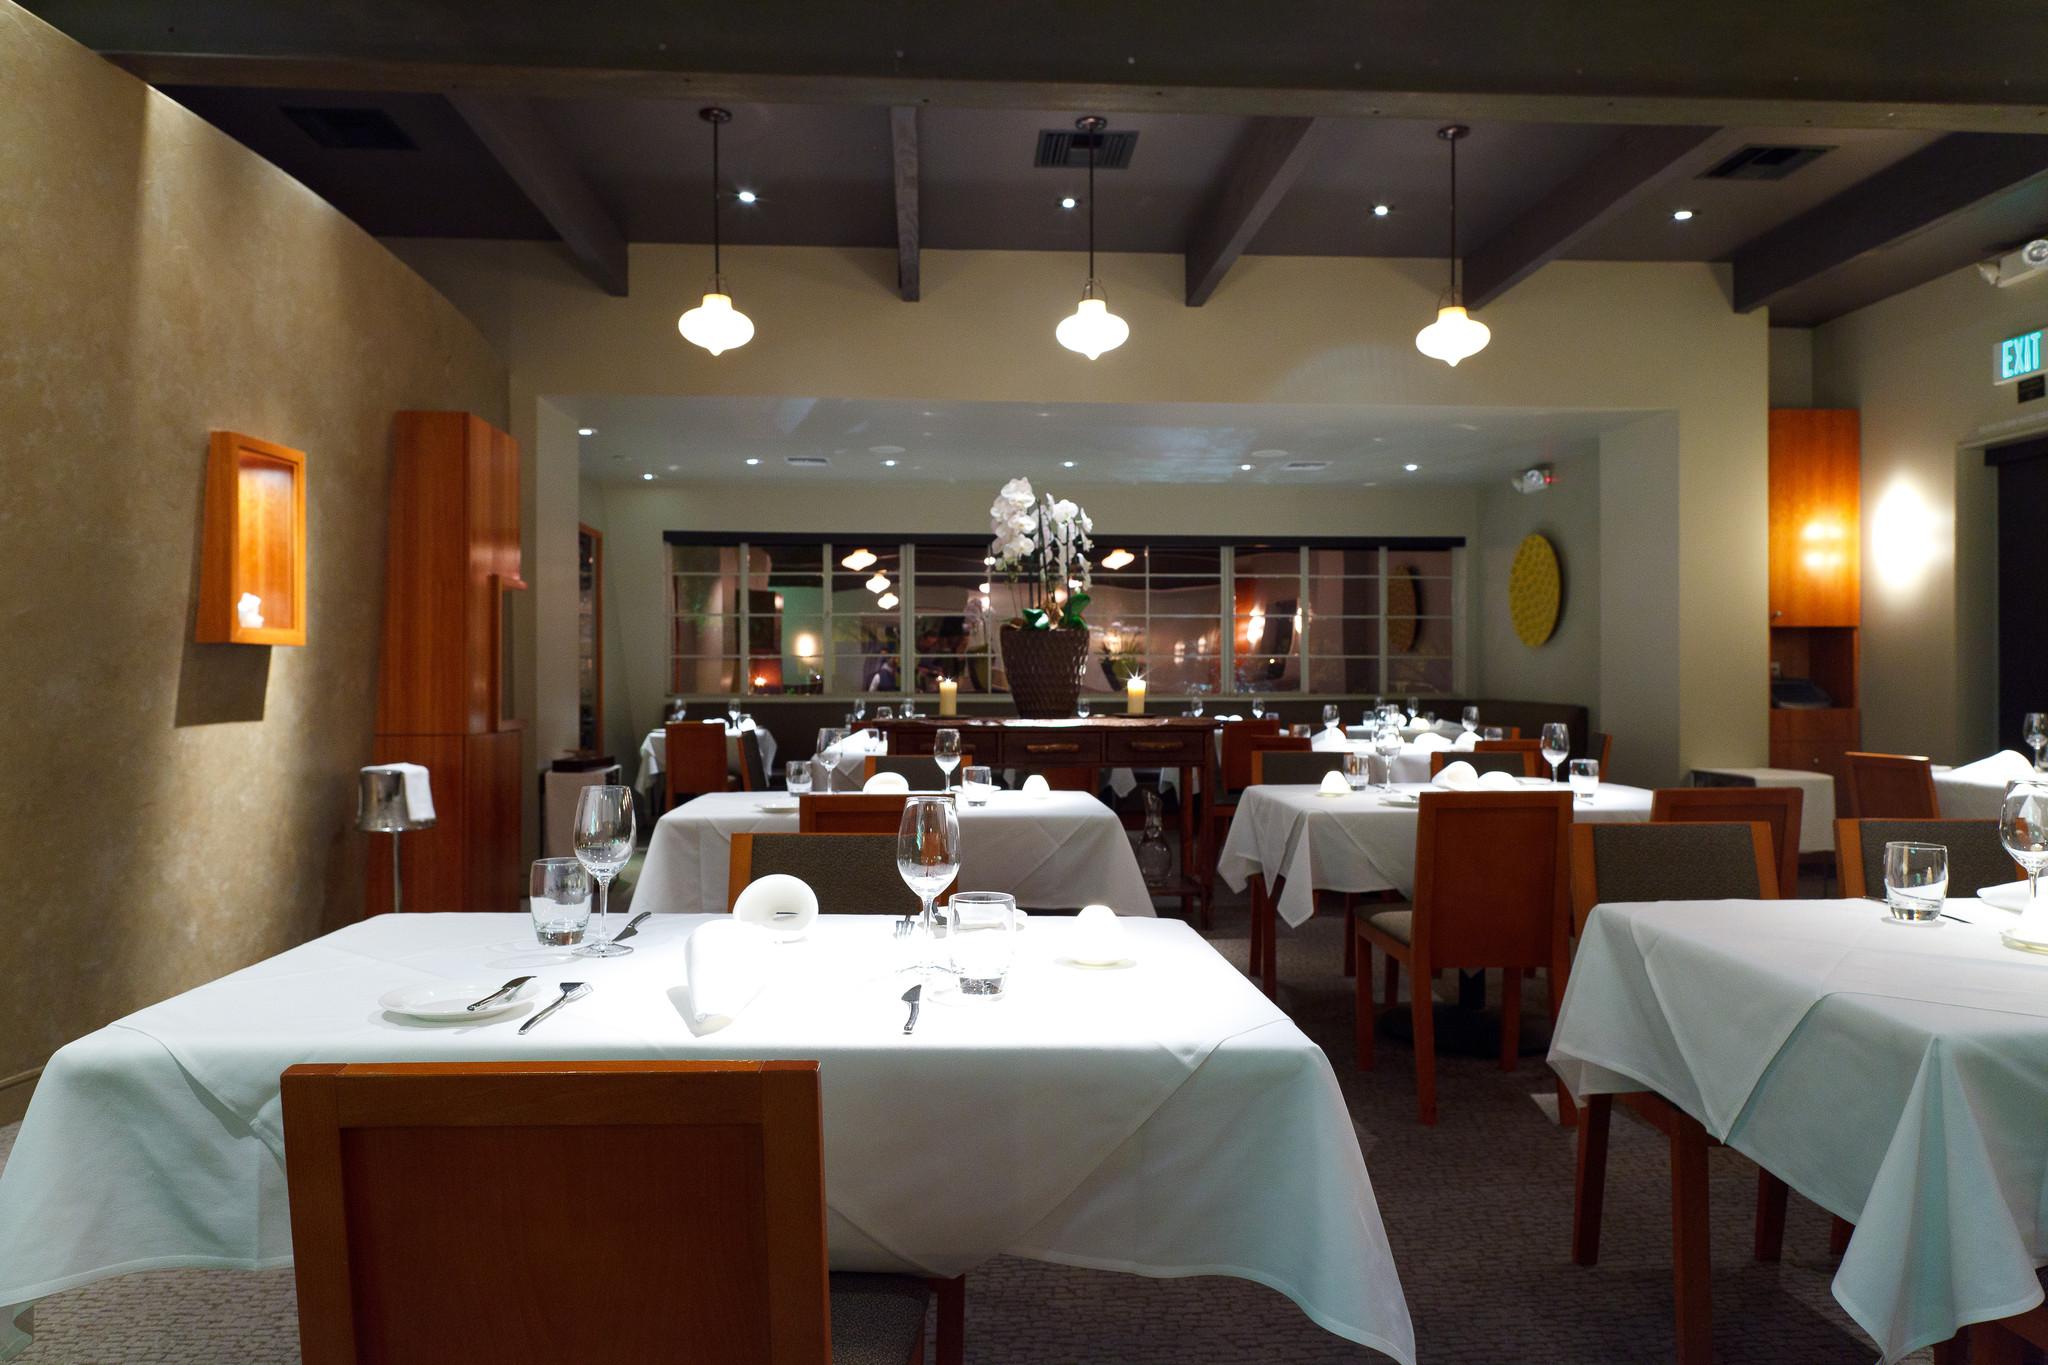 Manresa-San-Francisco-The-main-dining-room1.jpeg